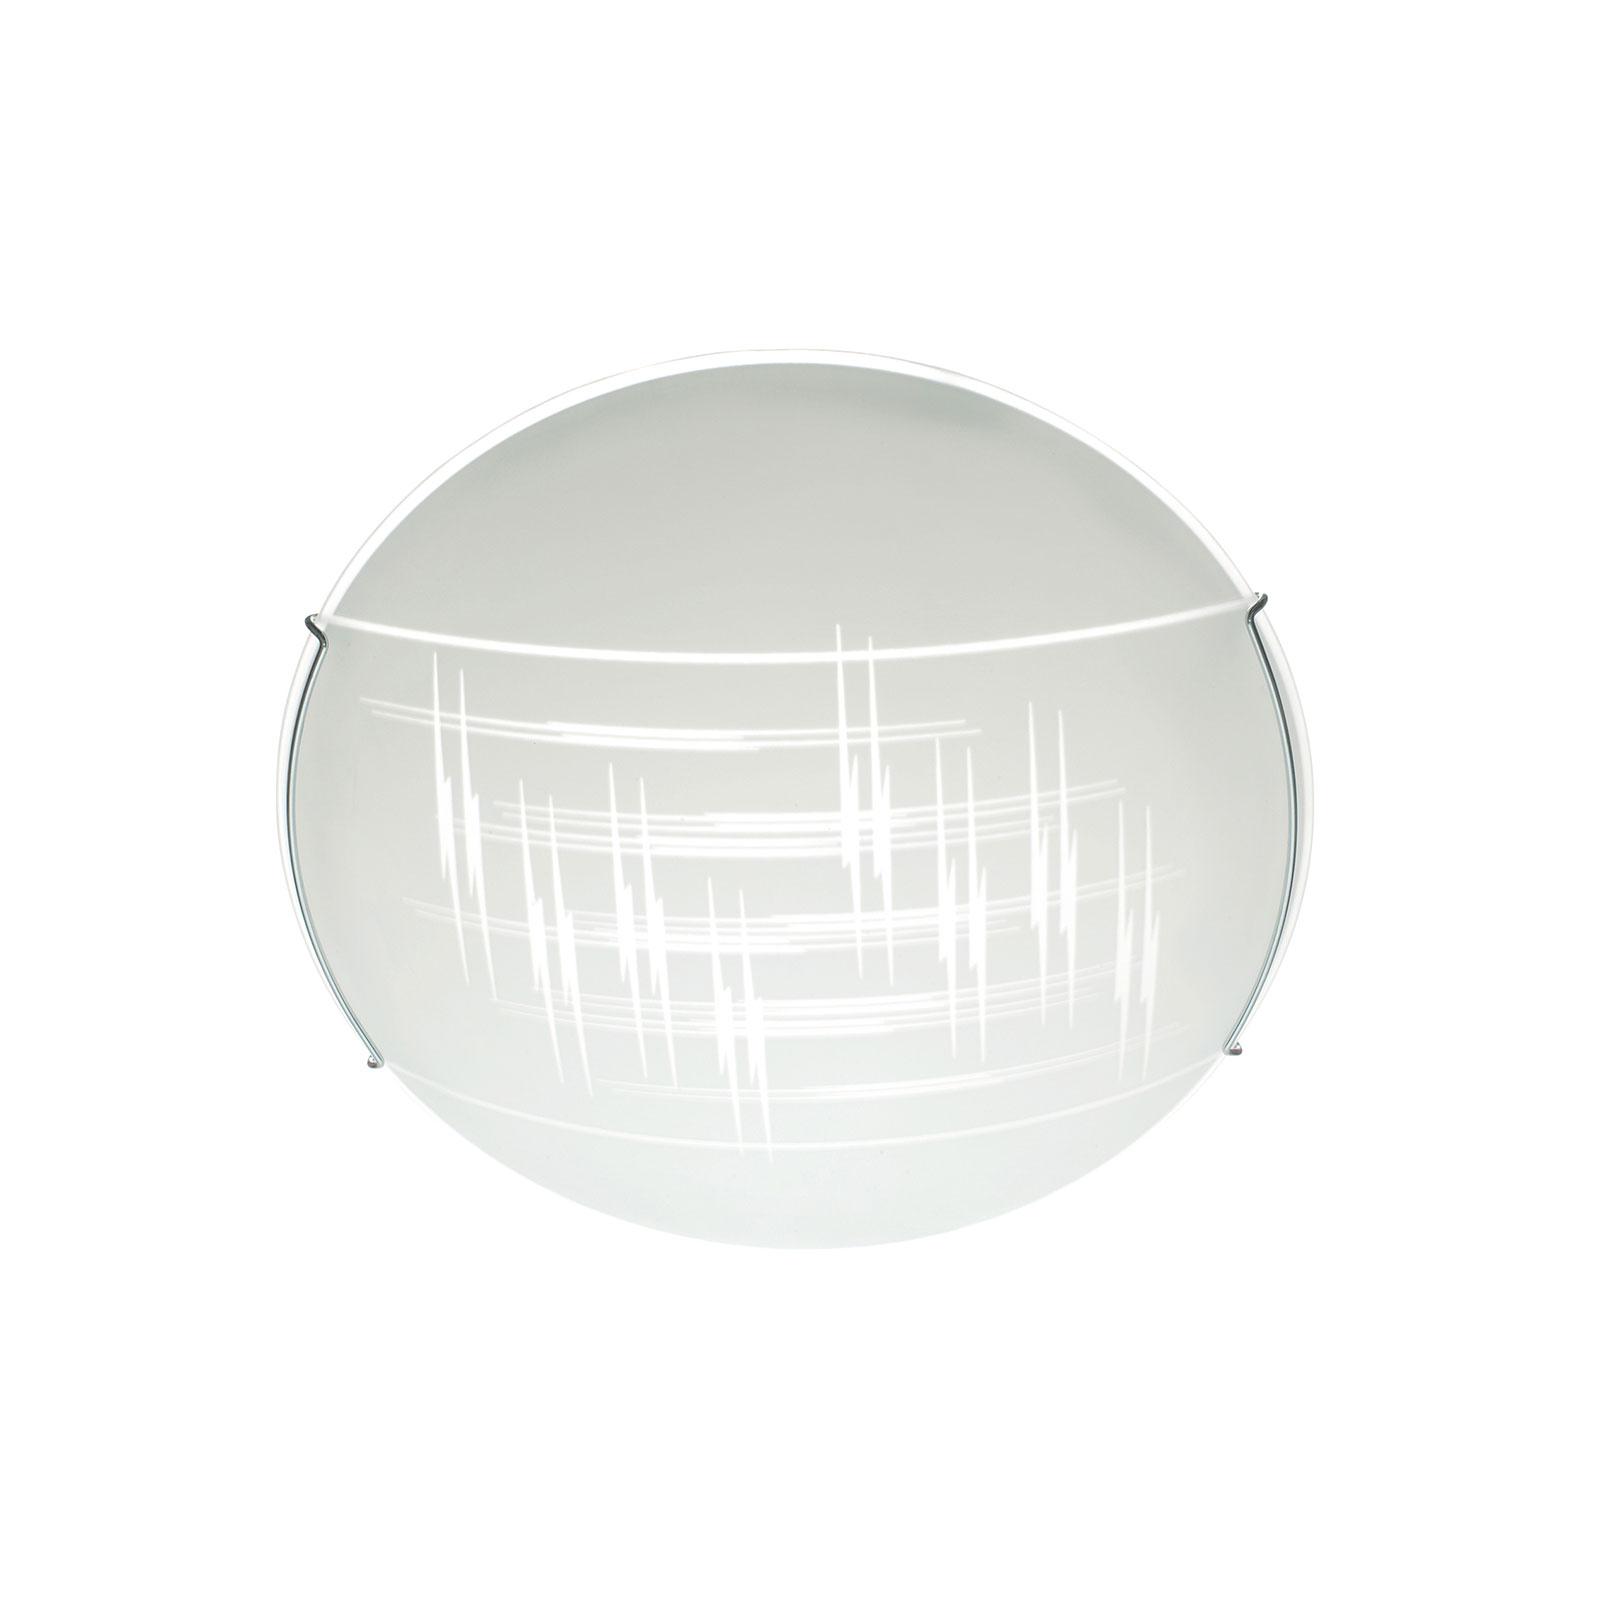 Kattovalaisin Scratch lasista, Ø 30 cm